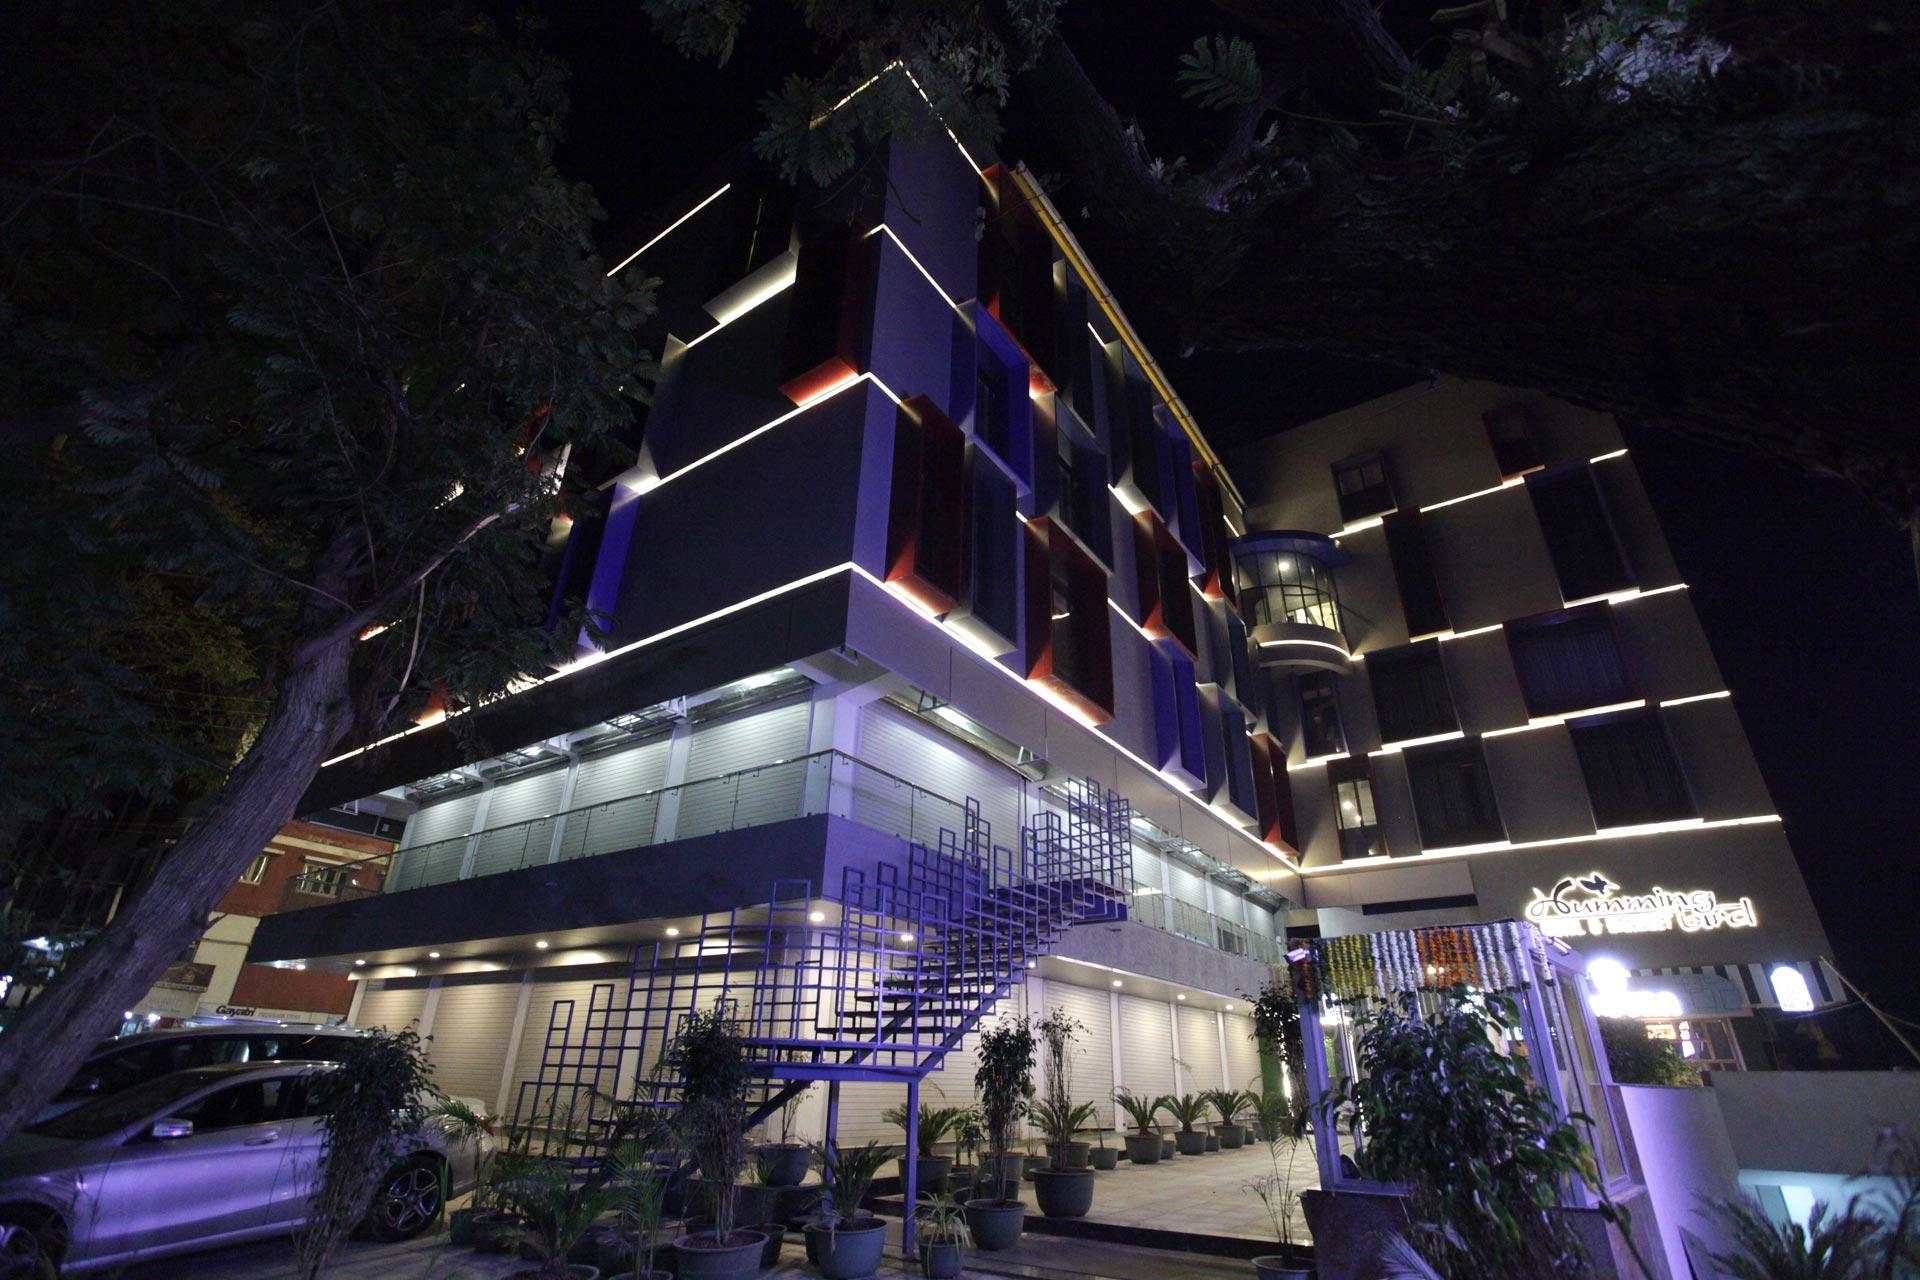 Hummingbird hotel and banquet night view